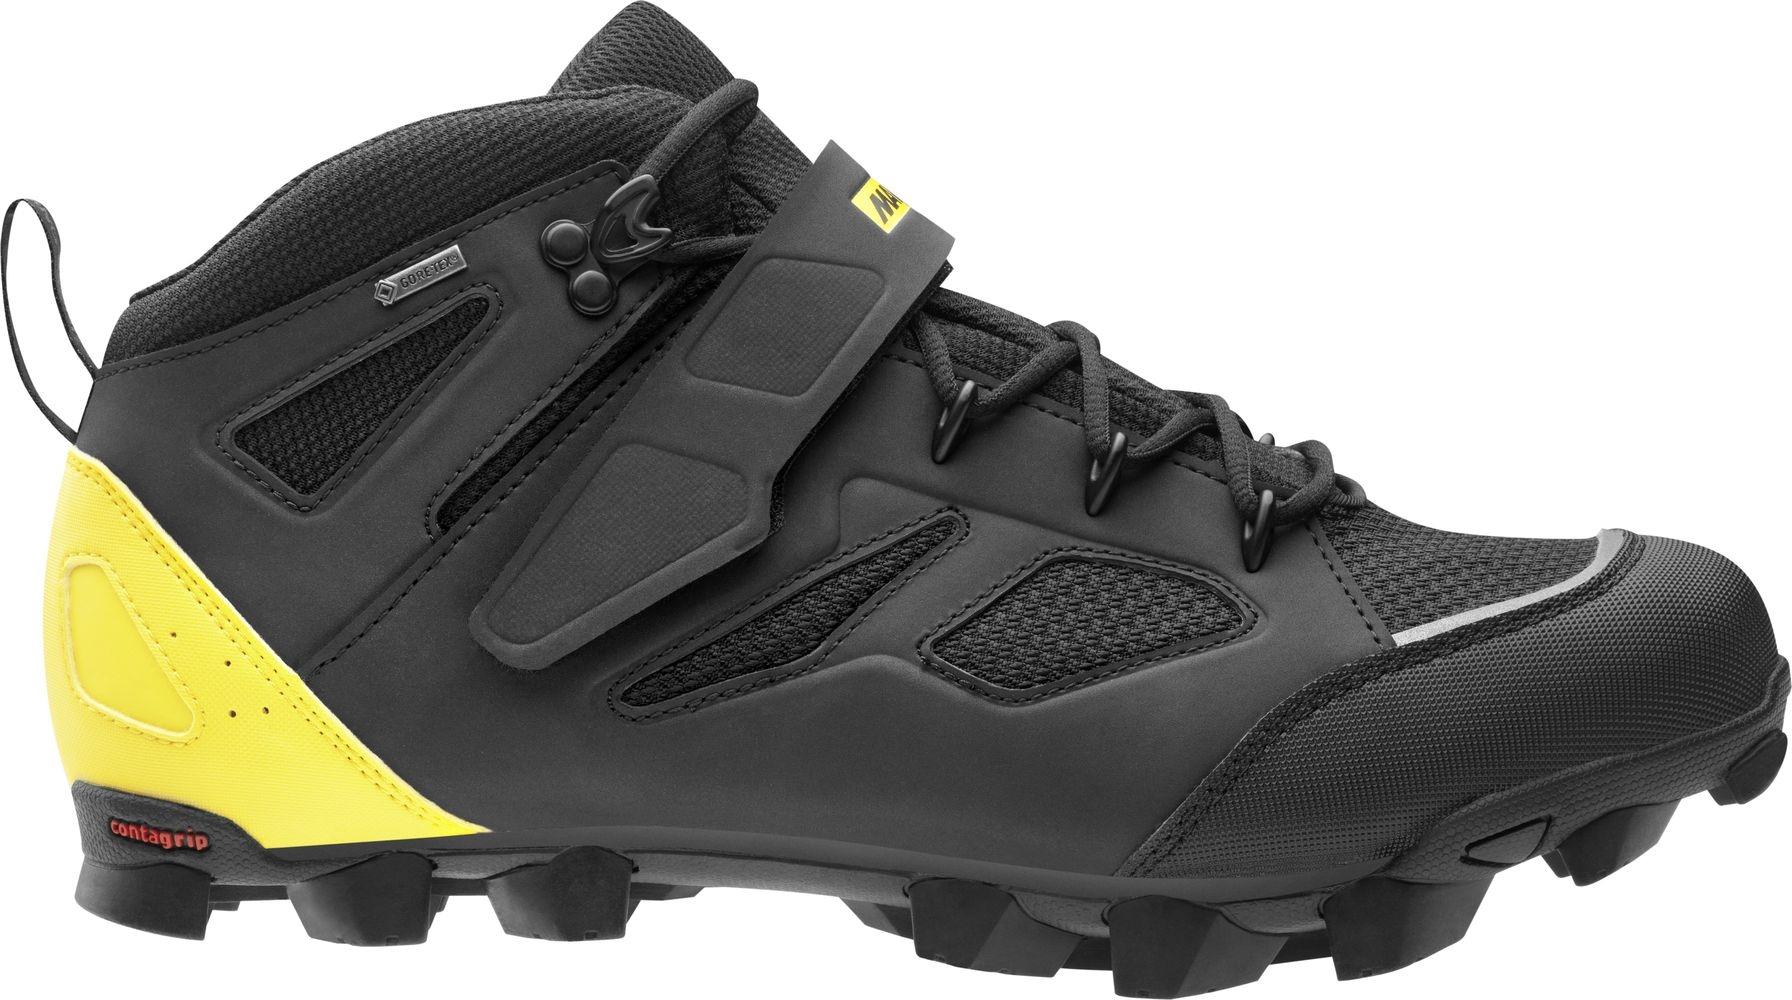 Chaussures hiver Mavic XA Pro H2O GTX Noir/Jaune - 43 1/3